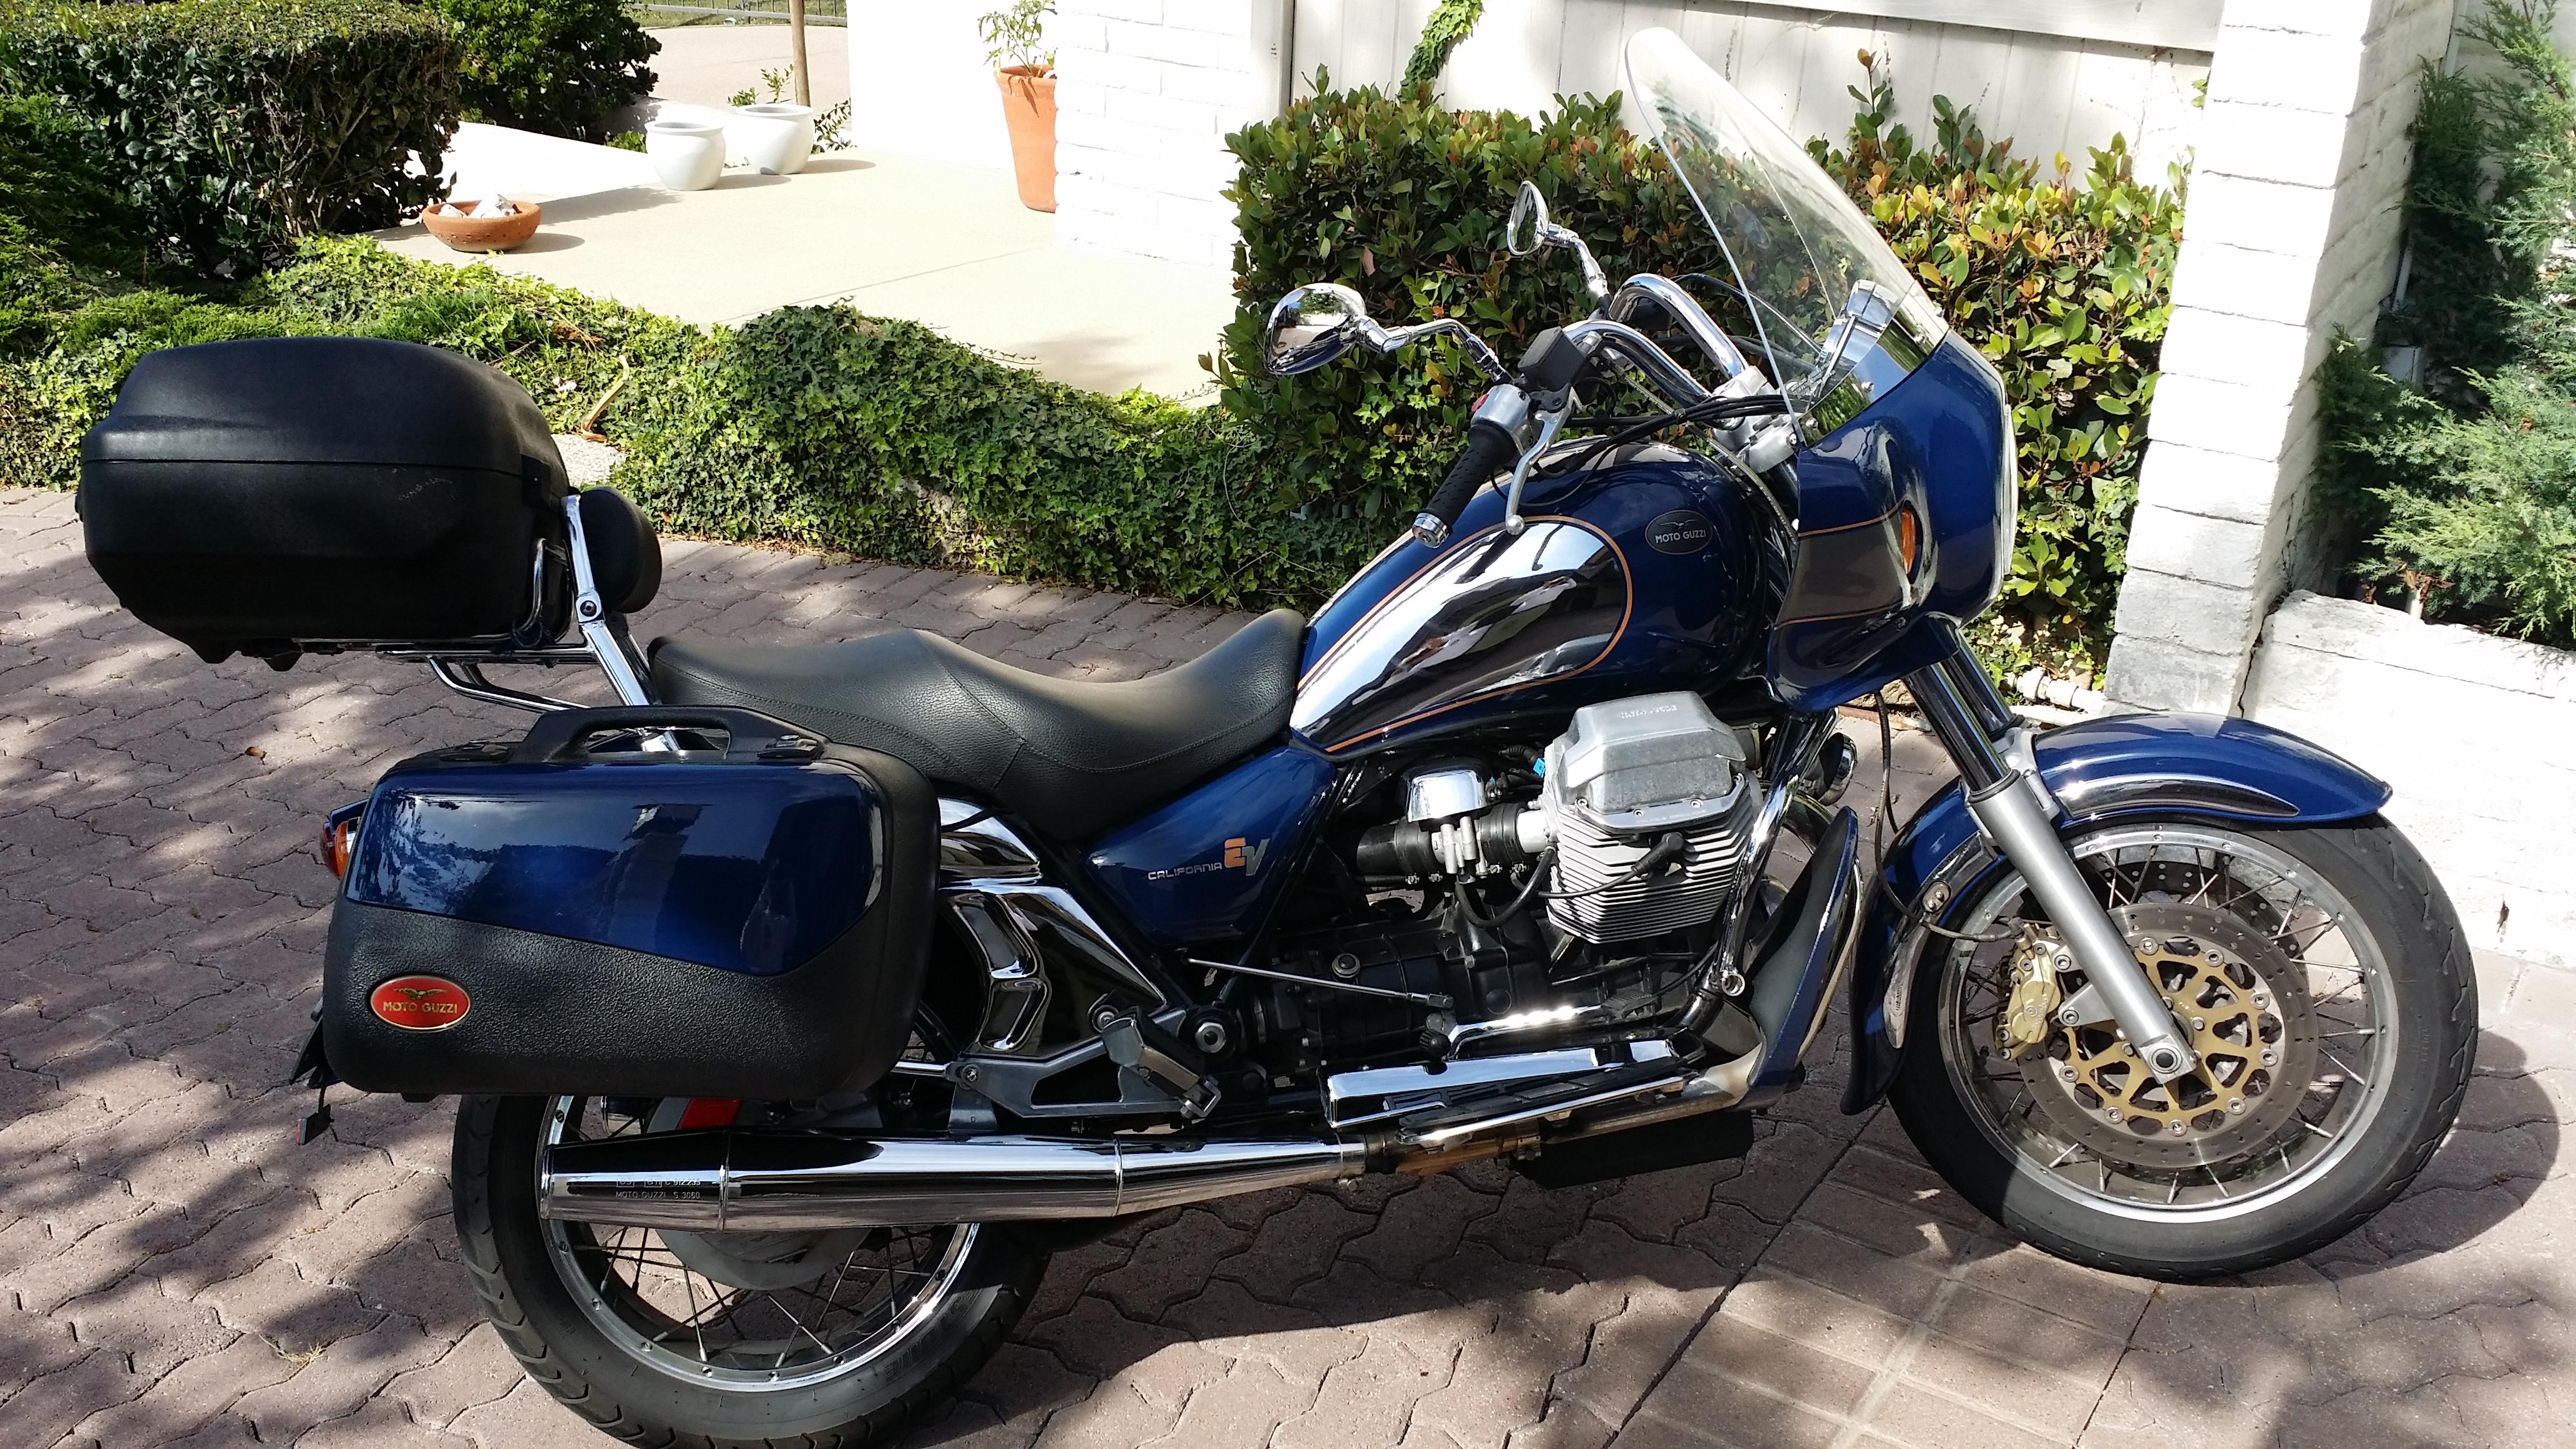 Avis sur Moto Guzzi California. Moto-guzzi-california-ev-touring-2004-moto